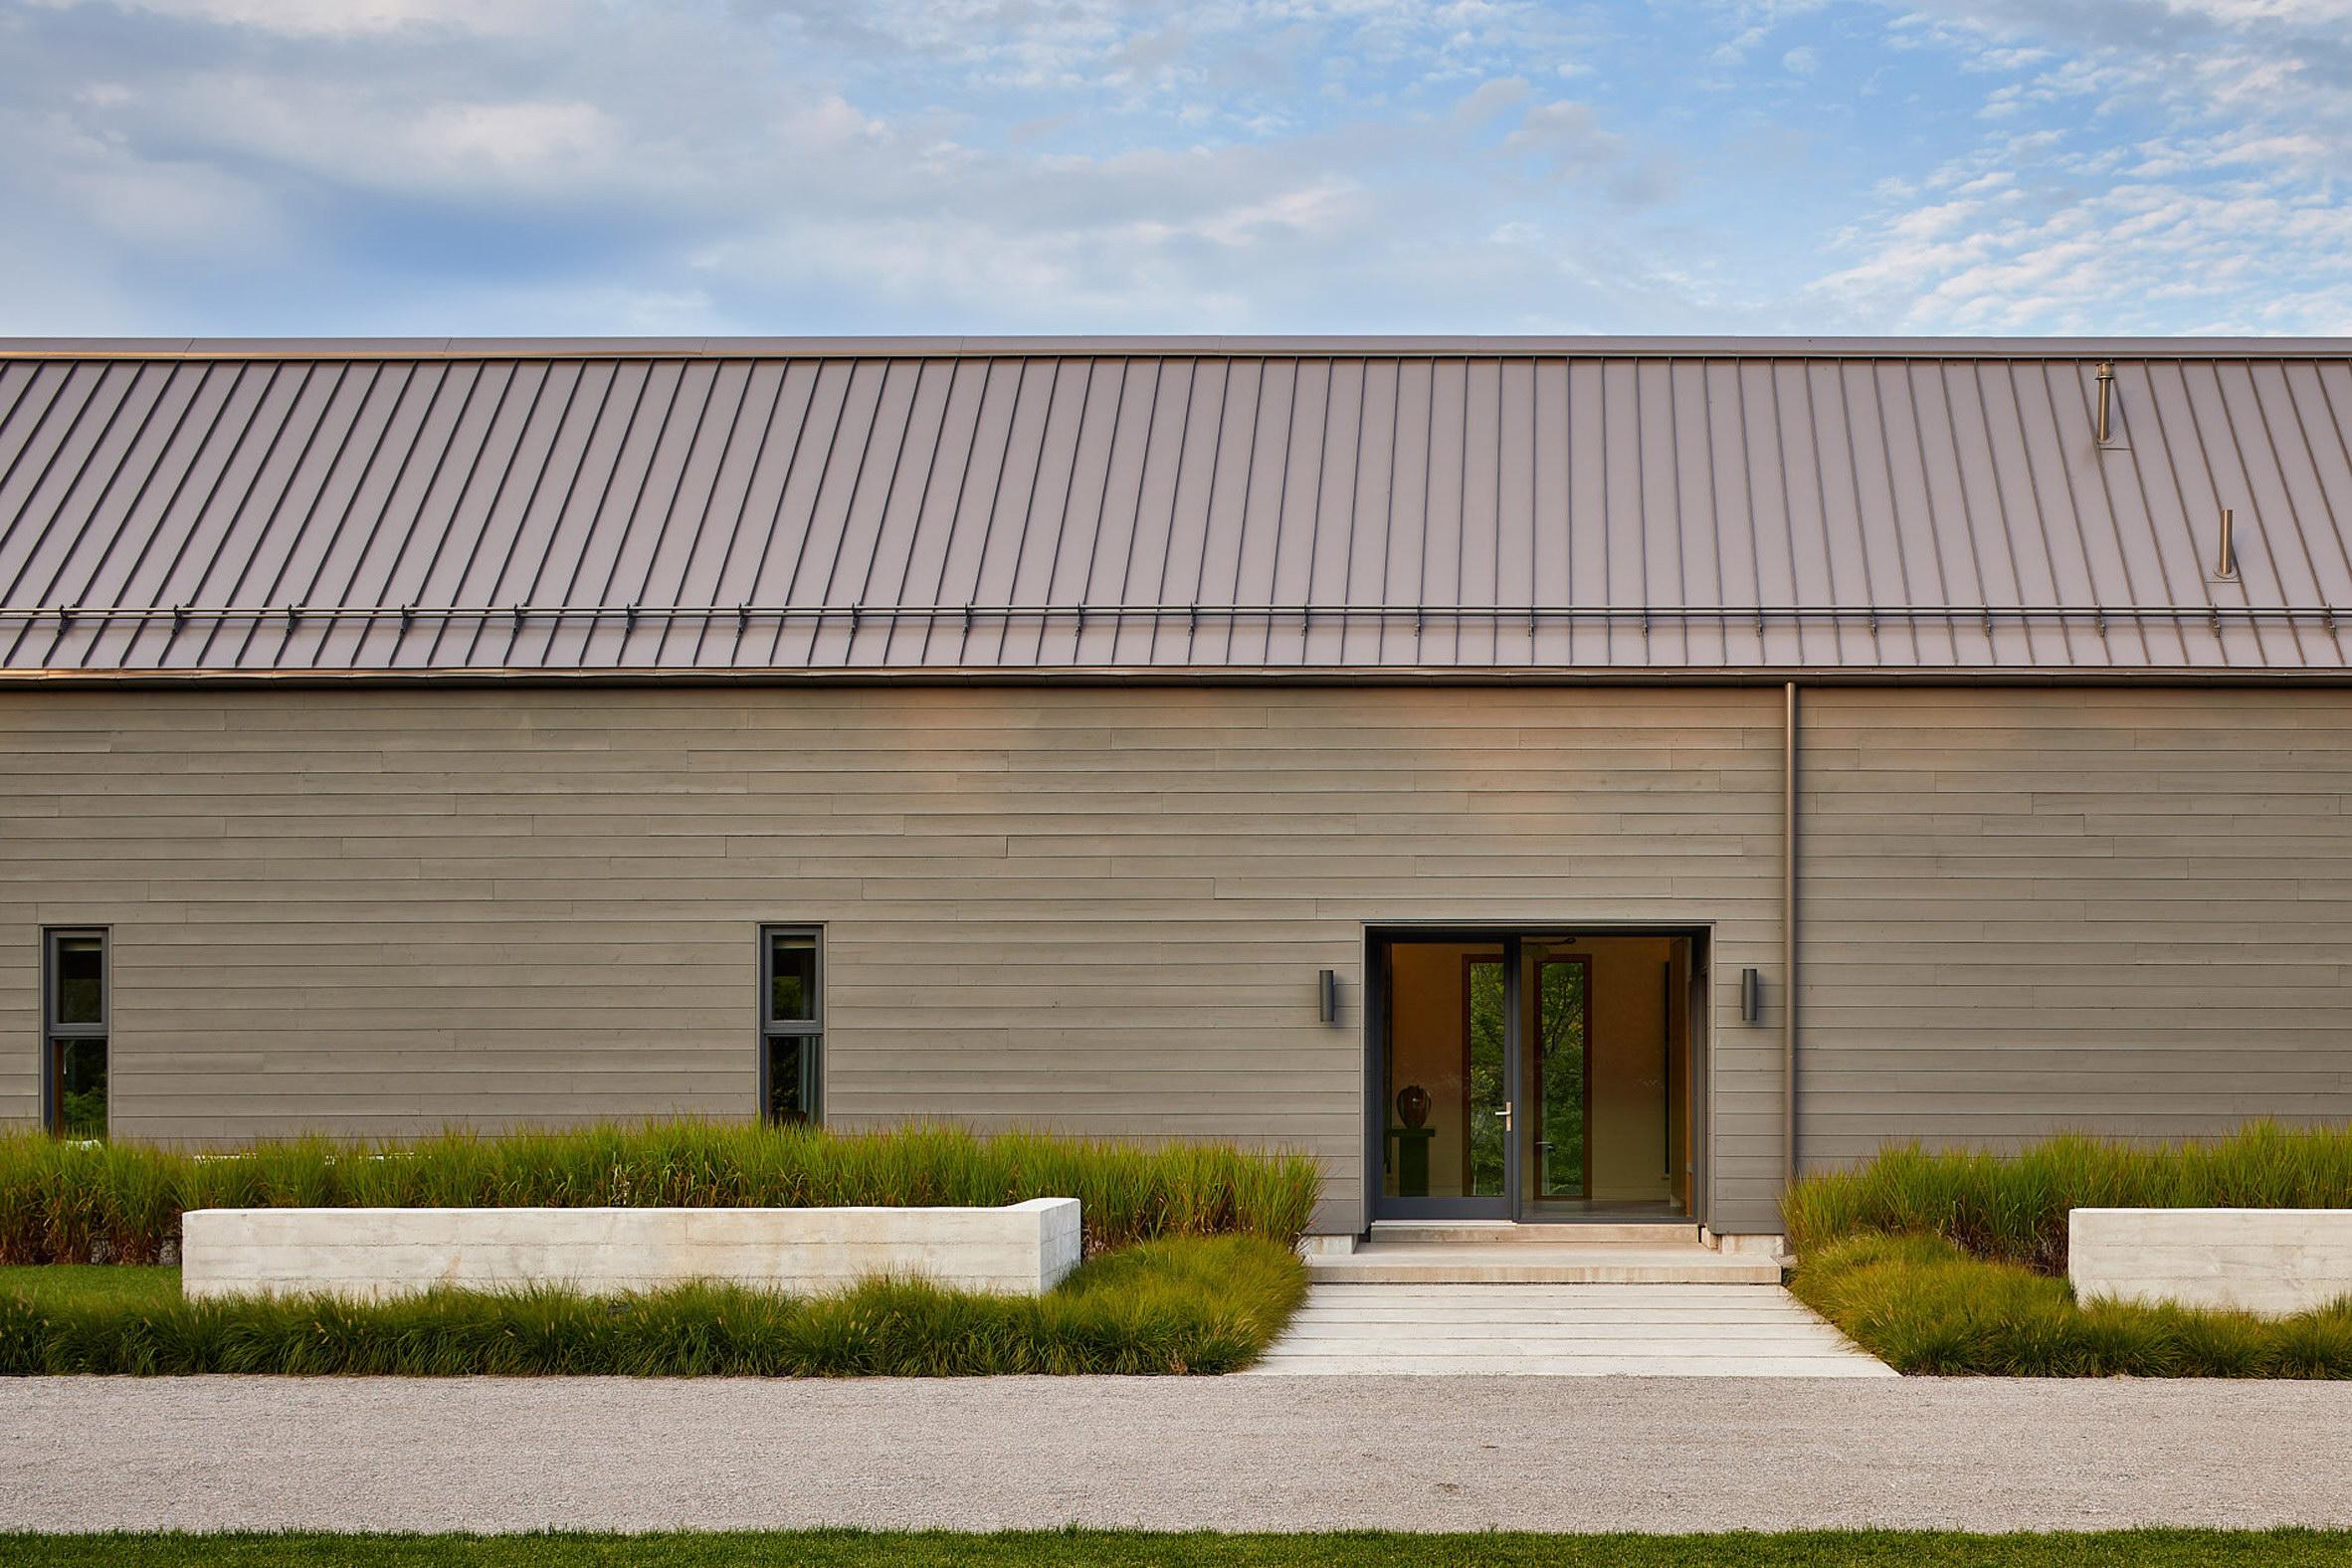 The Farm   Country Home by Scott Posno Design